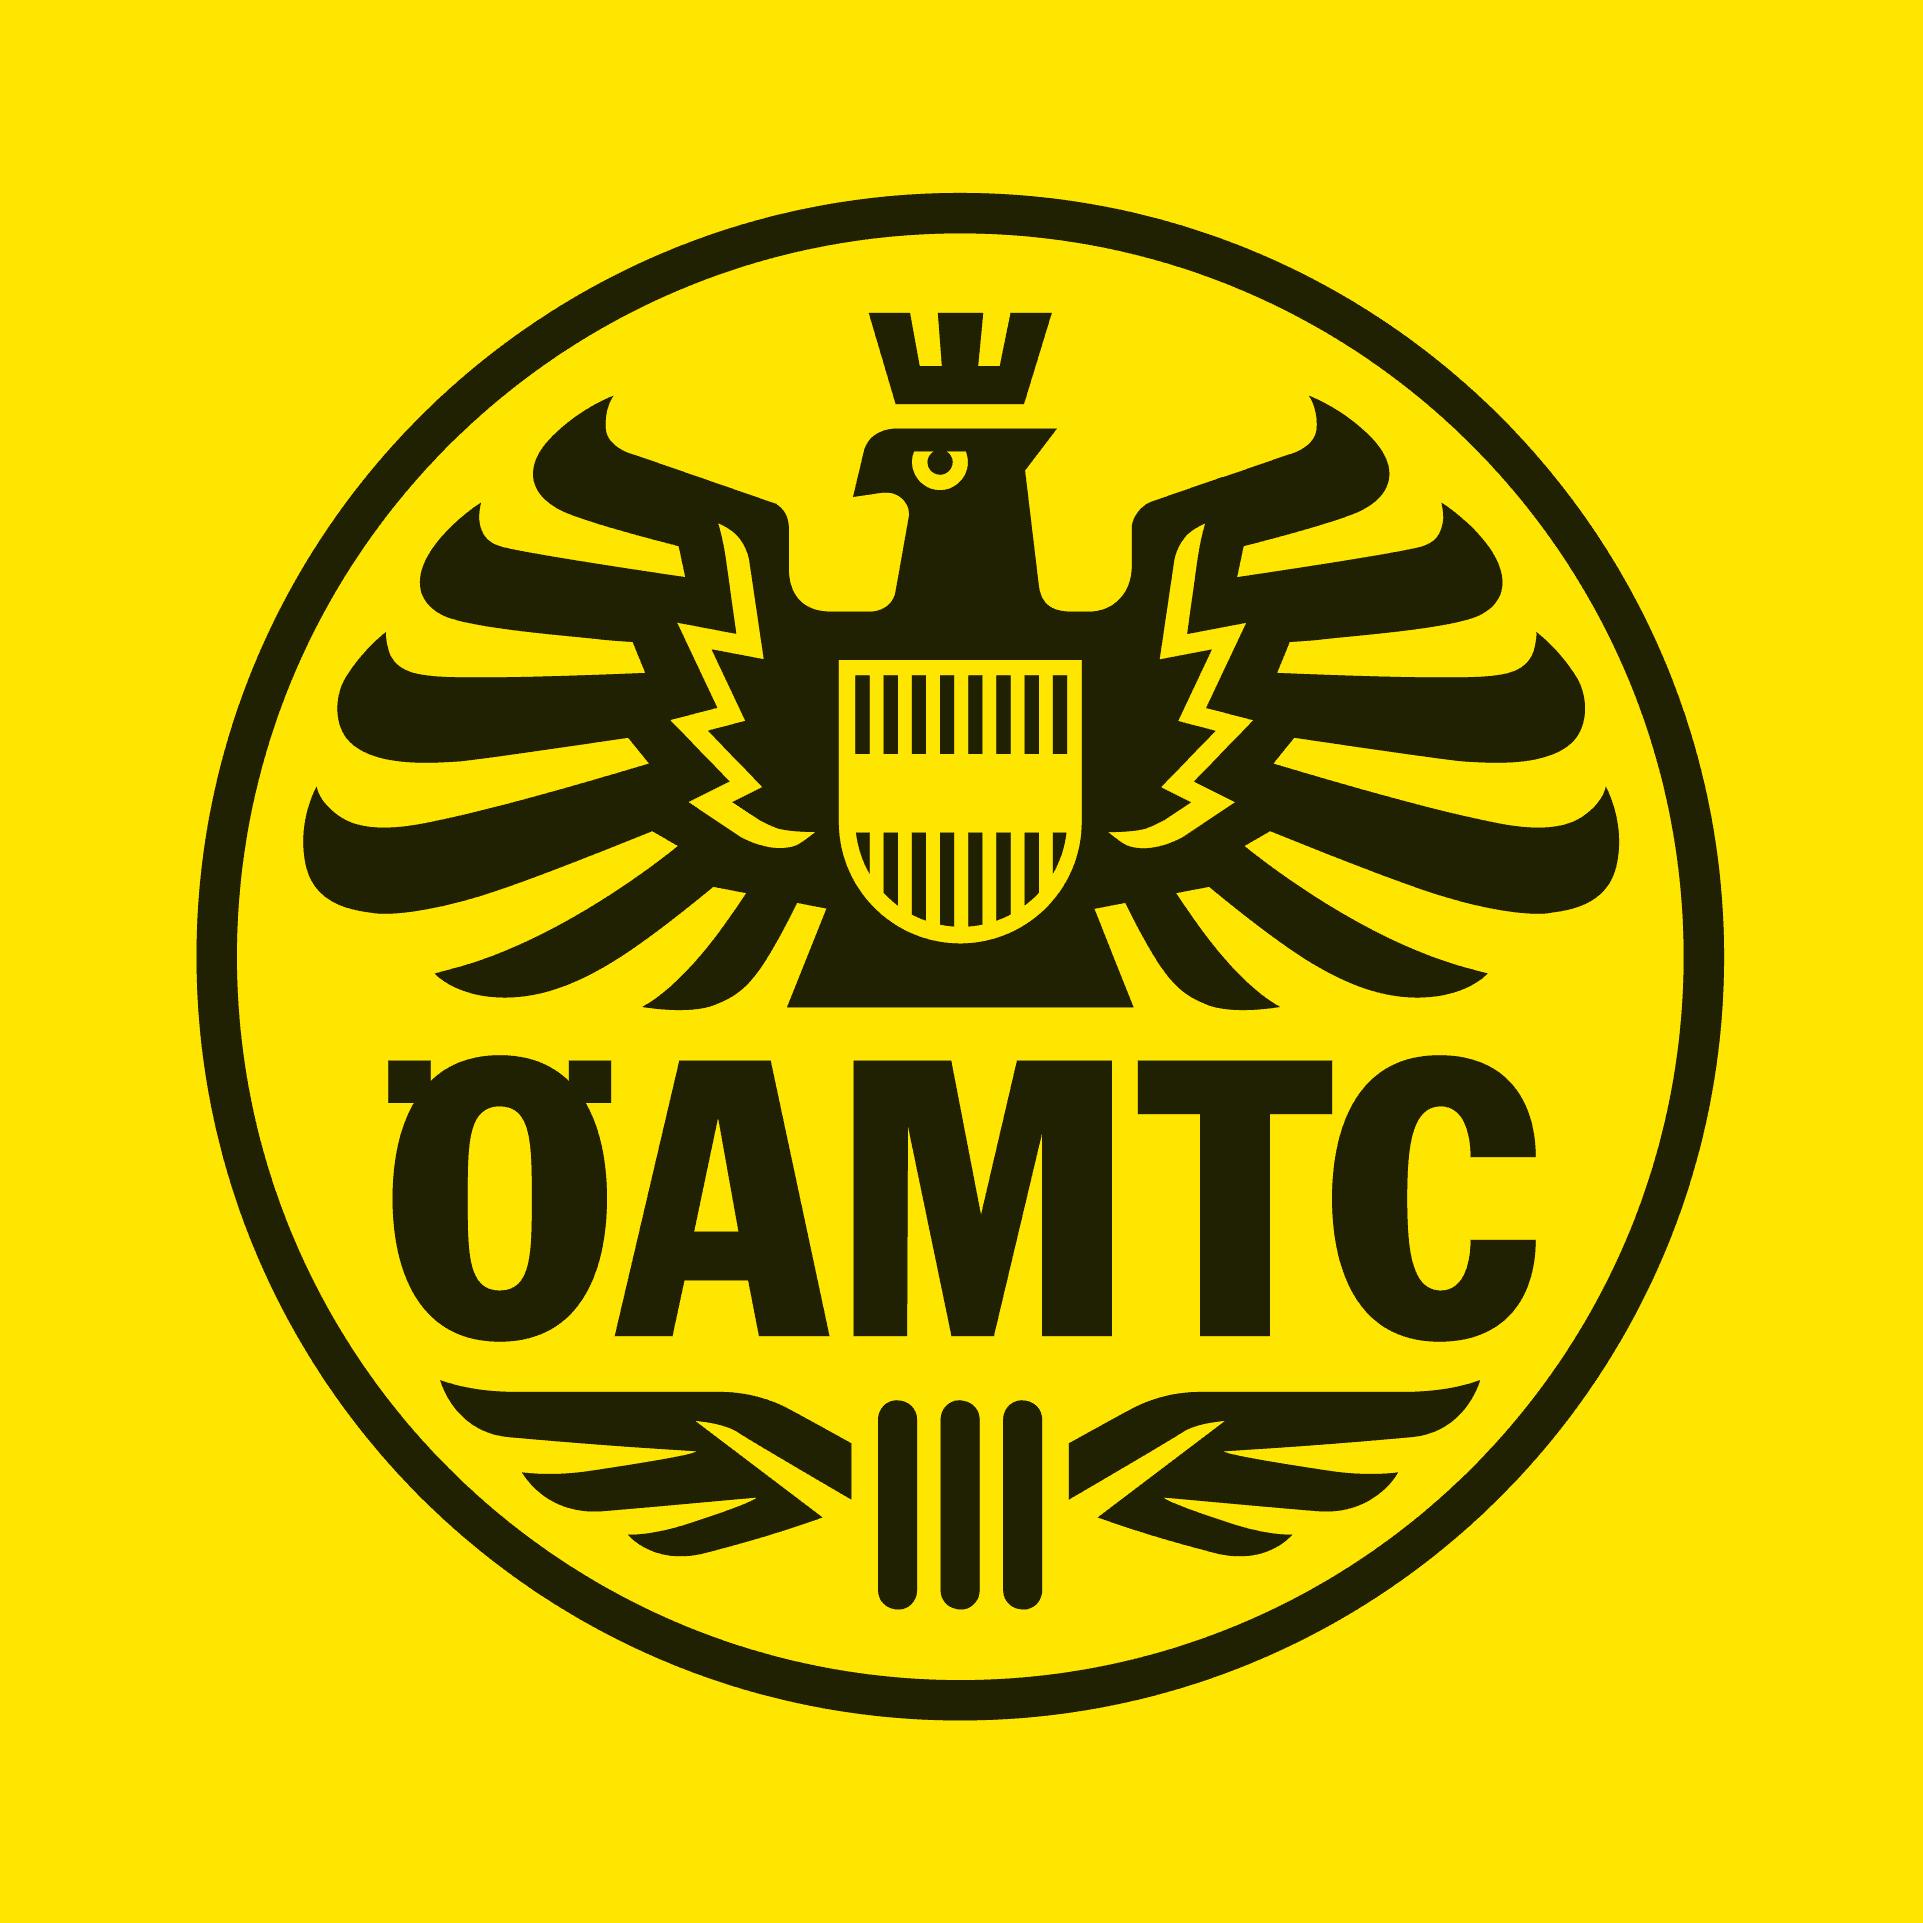 Yellow logo of the Austrian ÖAMTC